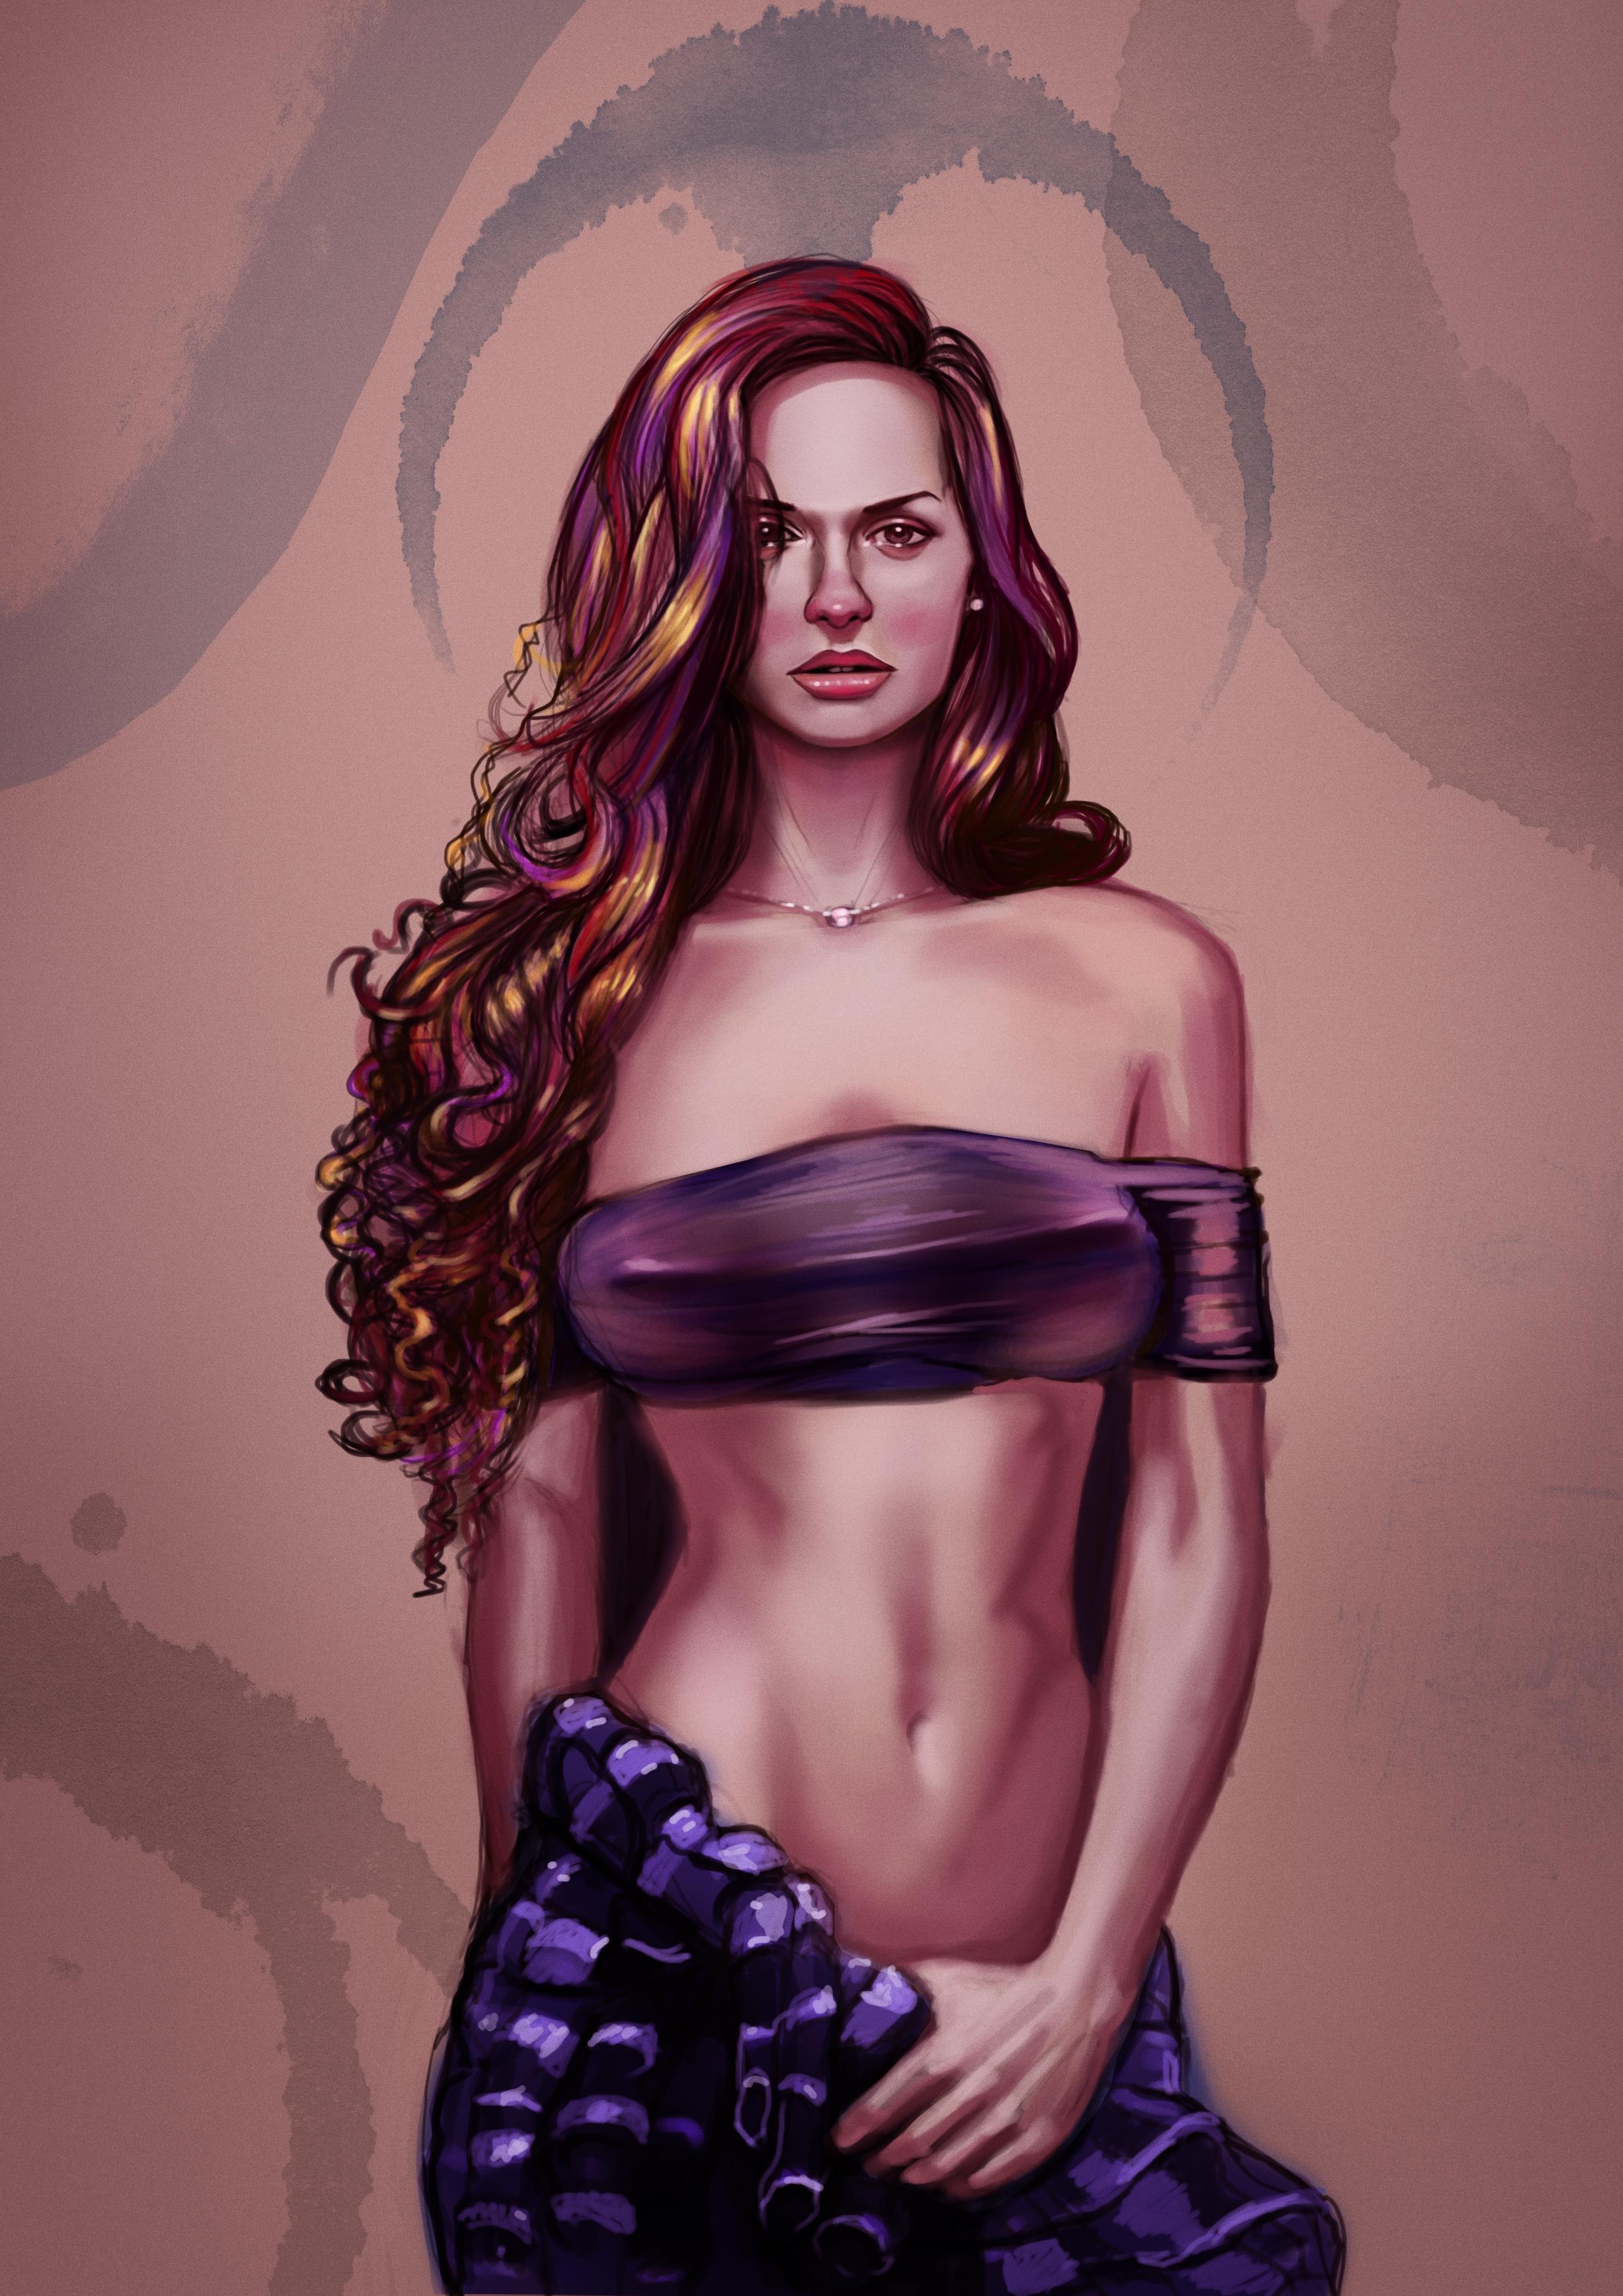 Red - Conceptual Art/Illustration - Kover Alexandru